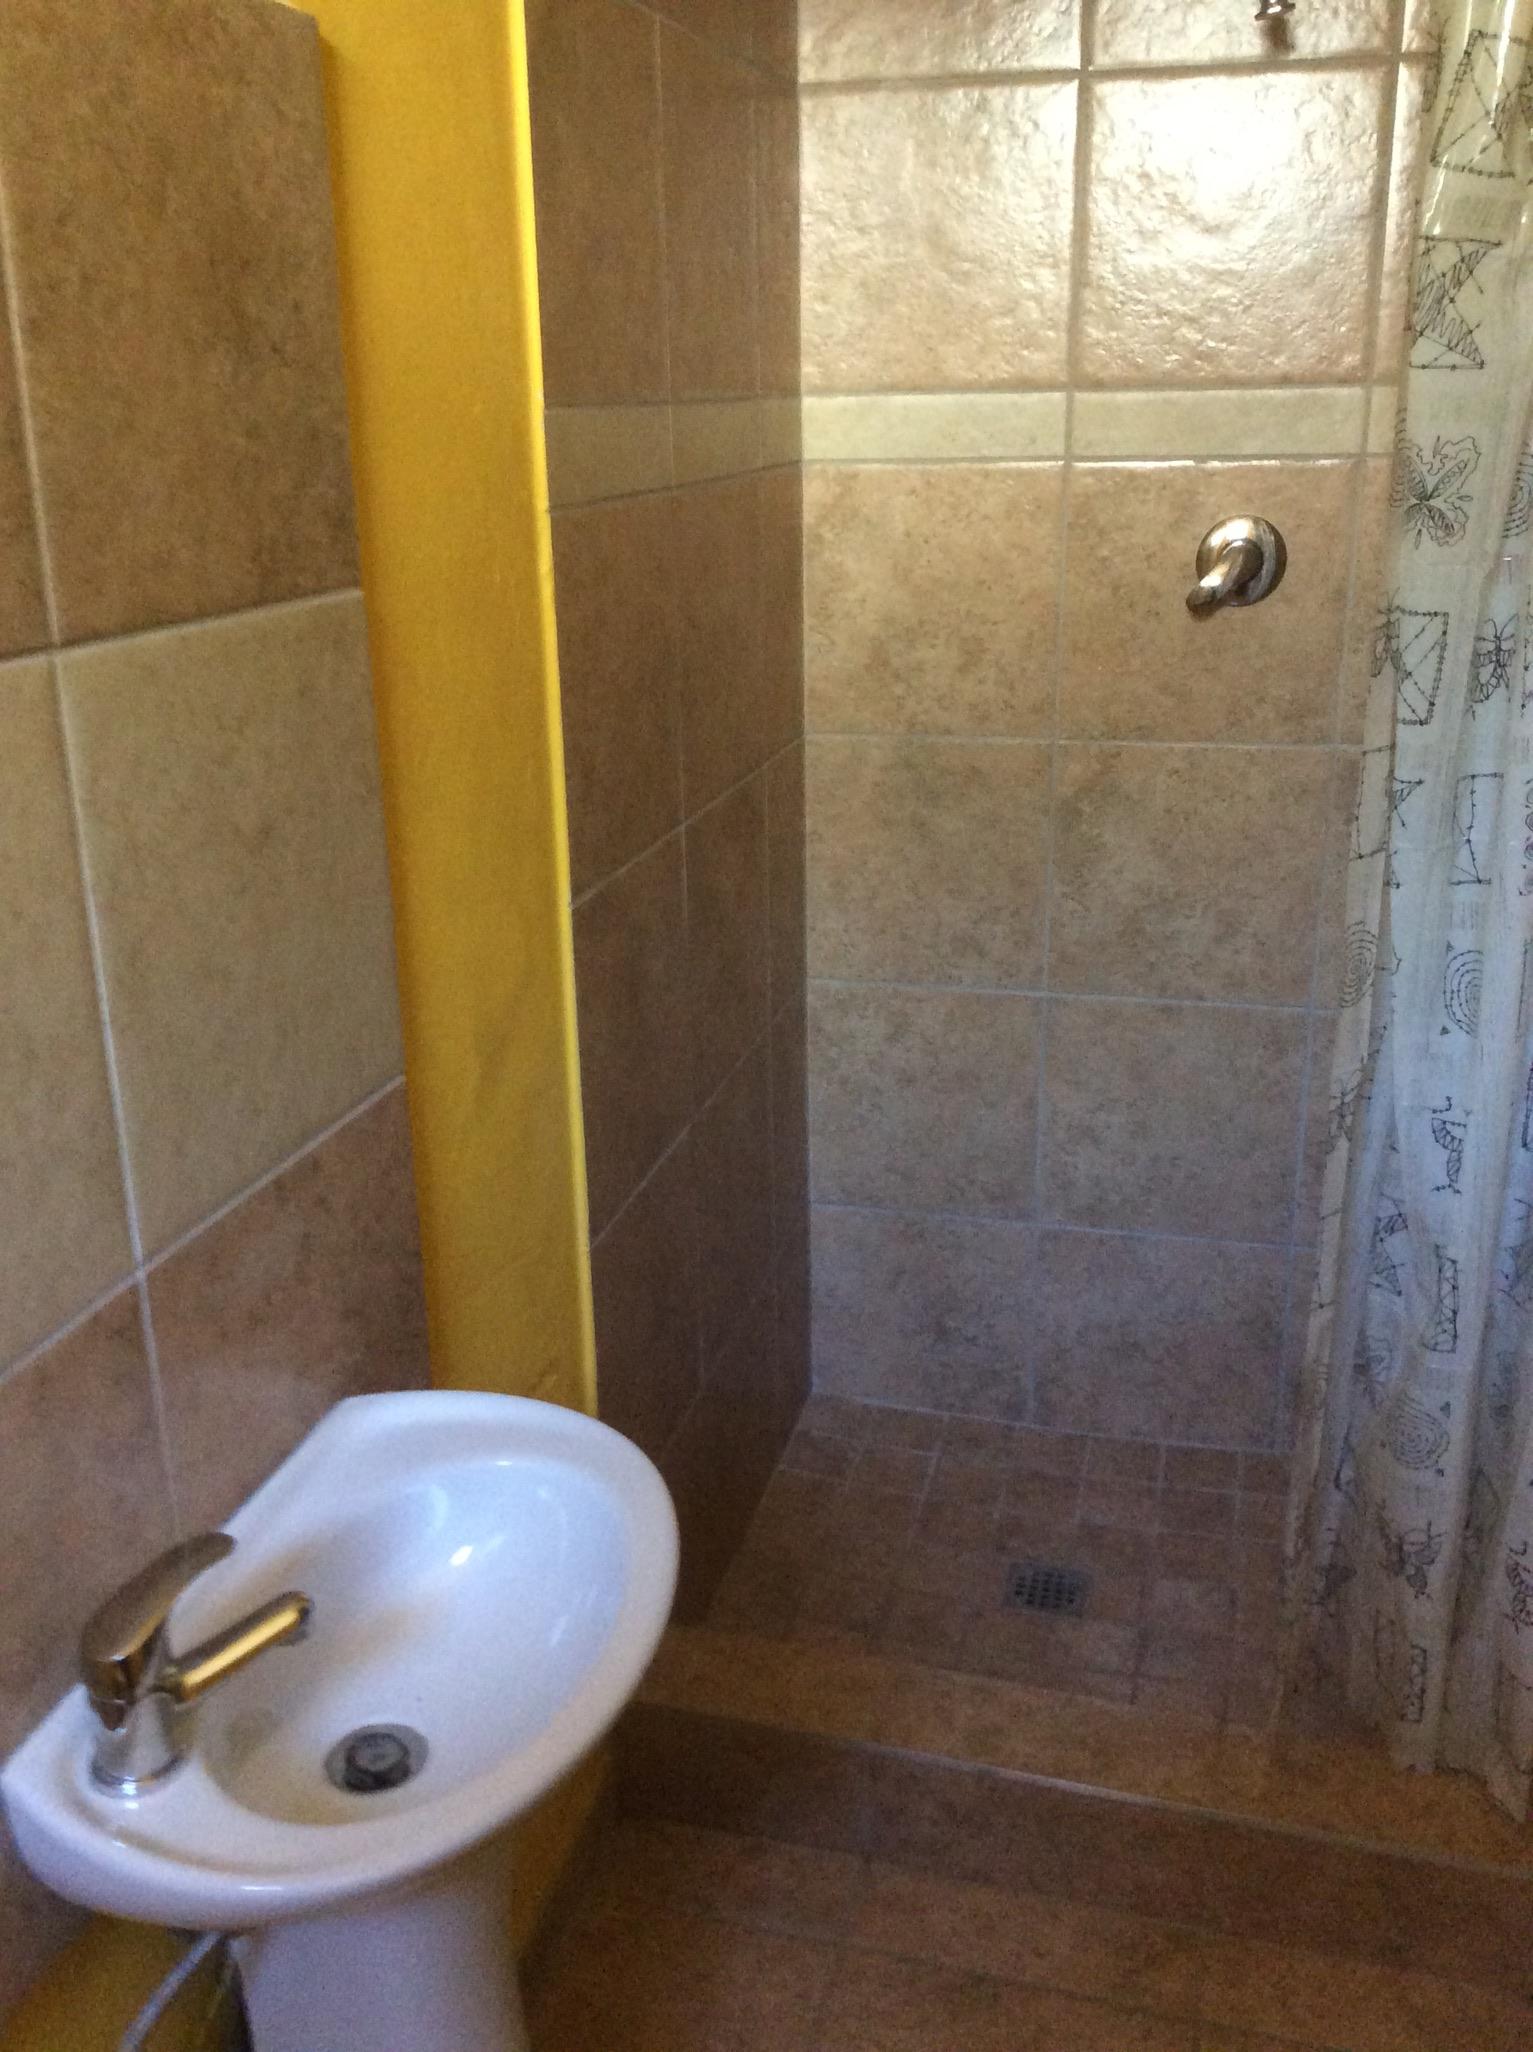 Studio Apartment To Rent Brixton (Johannesburg) R3200 per Month 073 746 6446